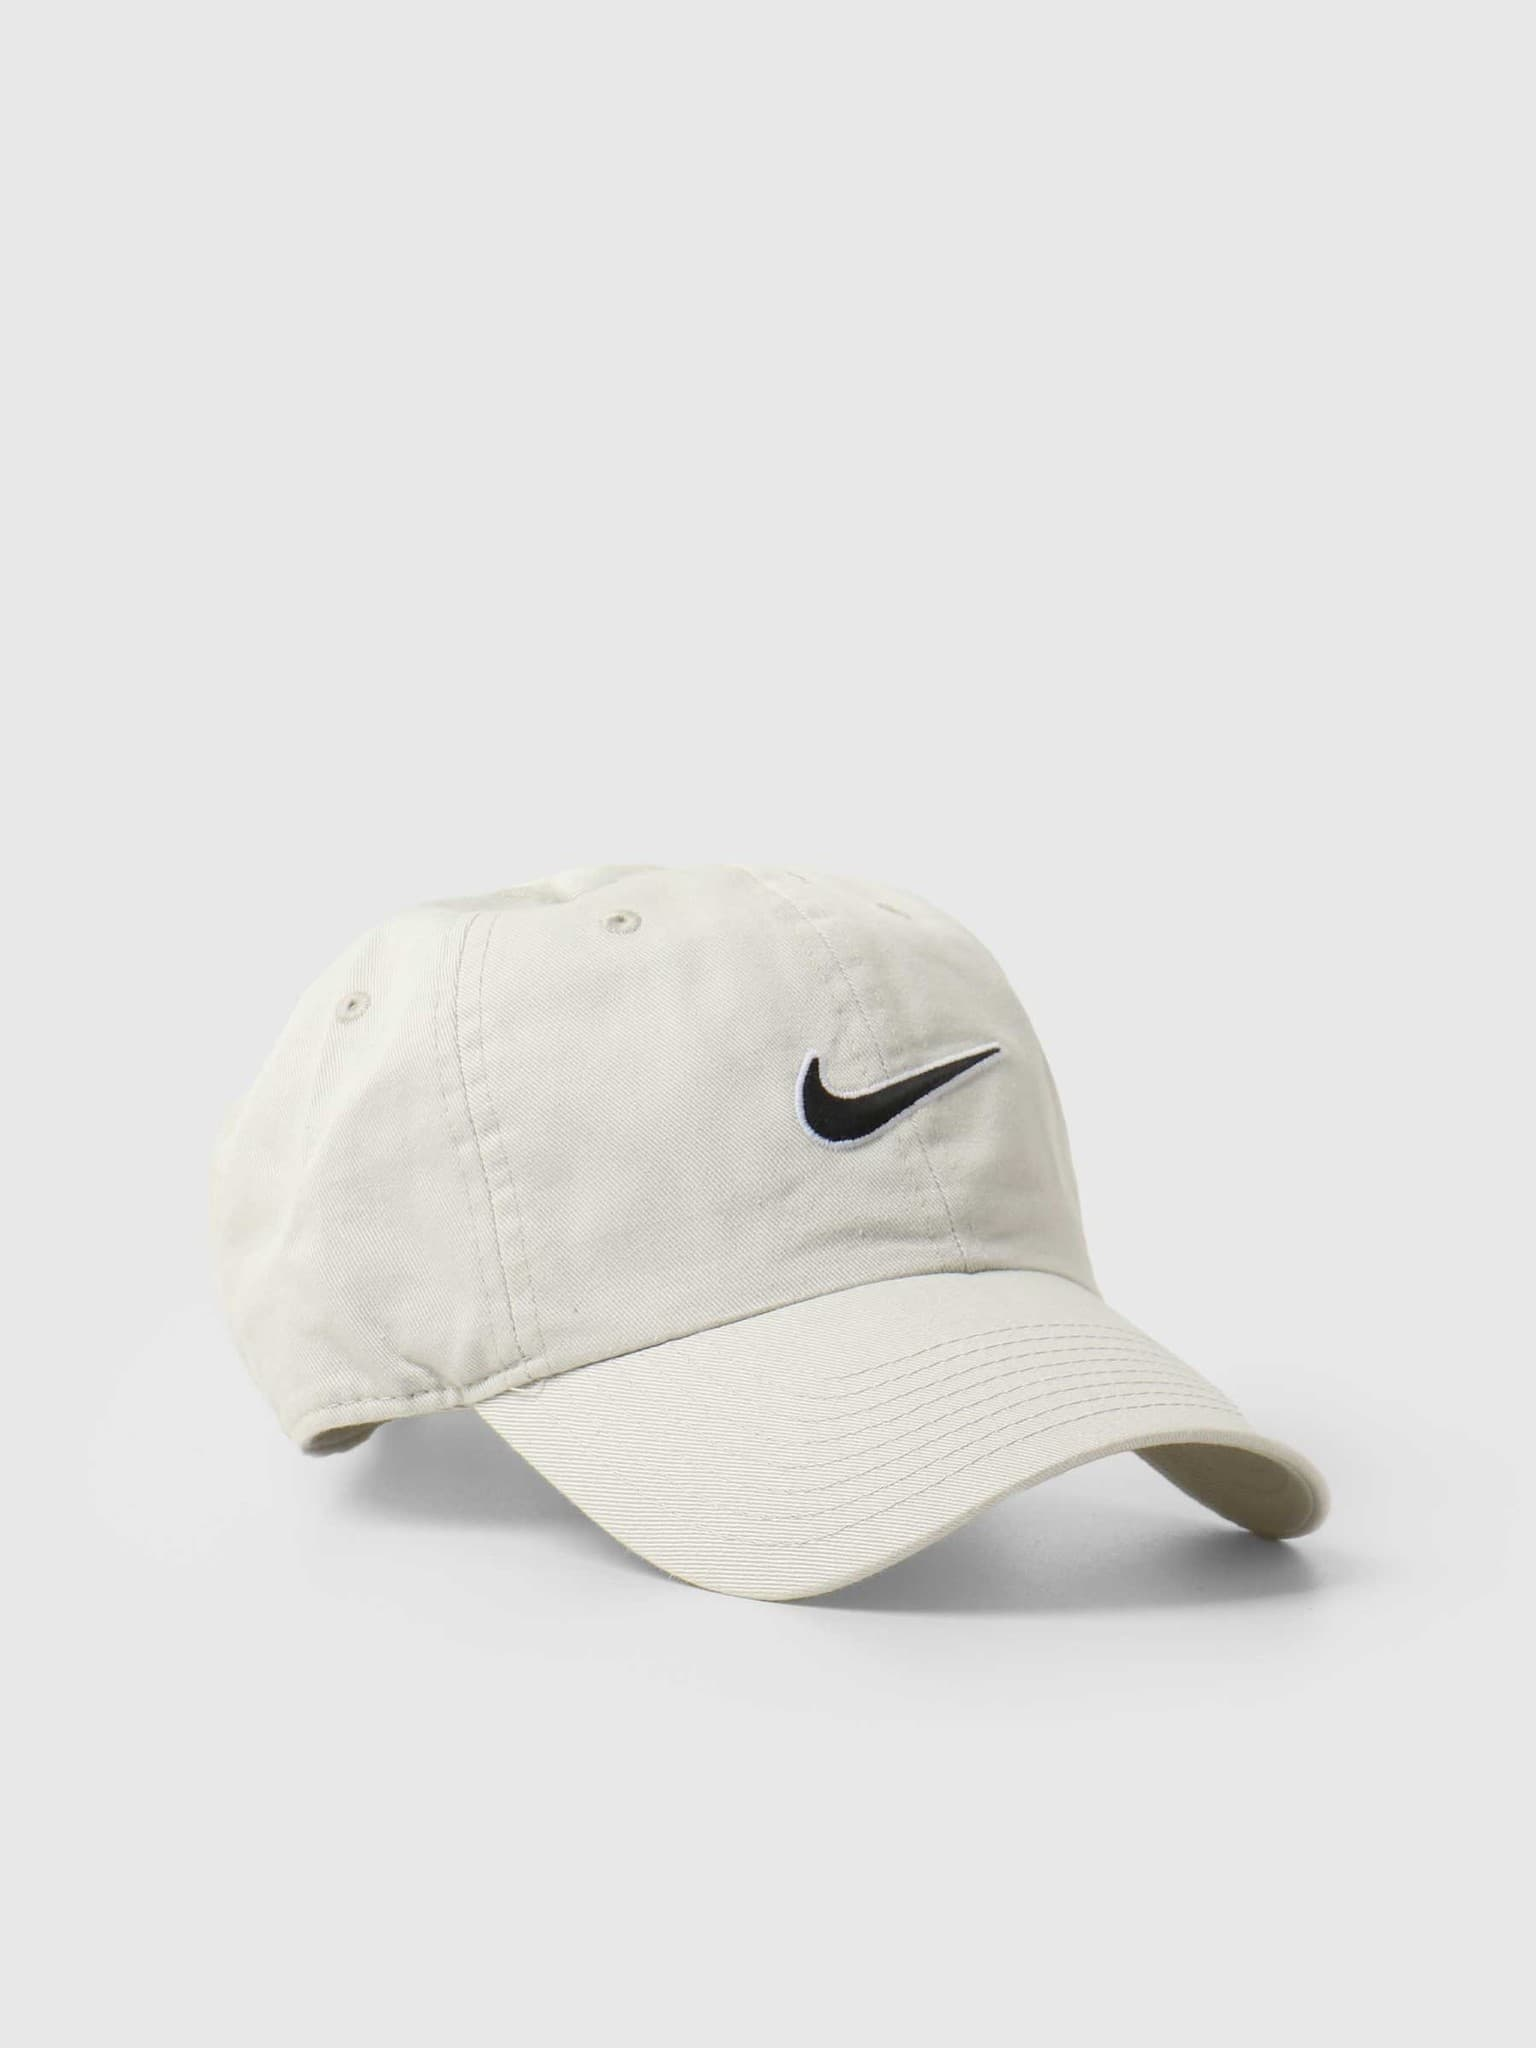 Sportswear Essentials Heritage86 Cap Light Bone Black 943091-072